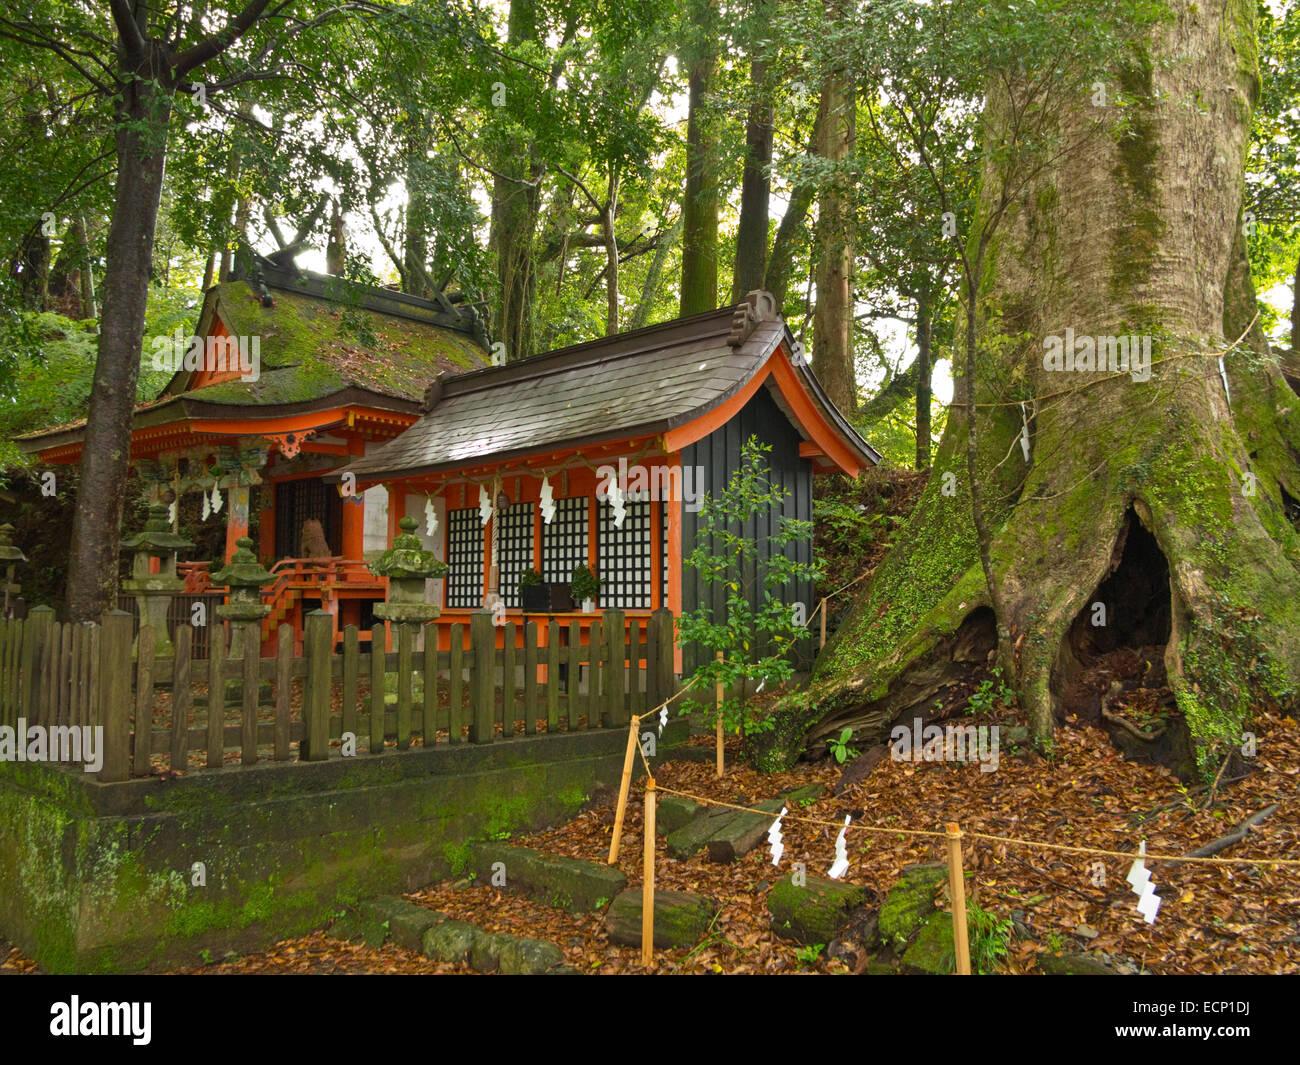 Takahara Kumano-jinja shrine at village of Takahara on Kumano Kodo Pilgrimage Route, Kii Peninsula, Wakayama Prefecture, - Stock Image